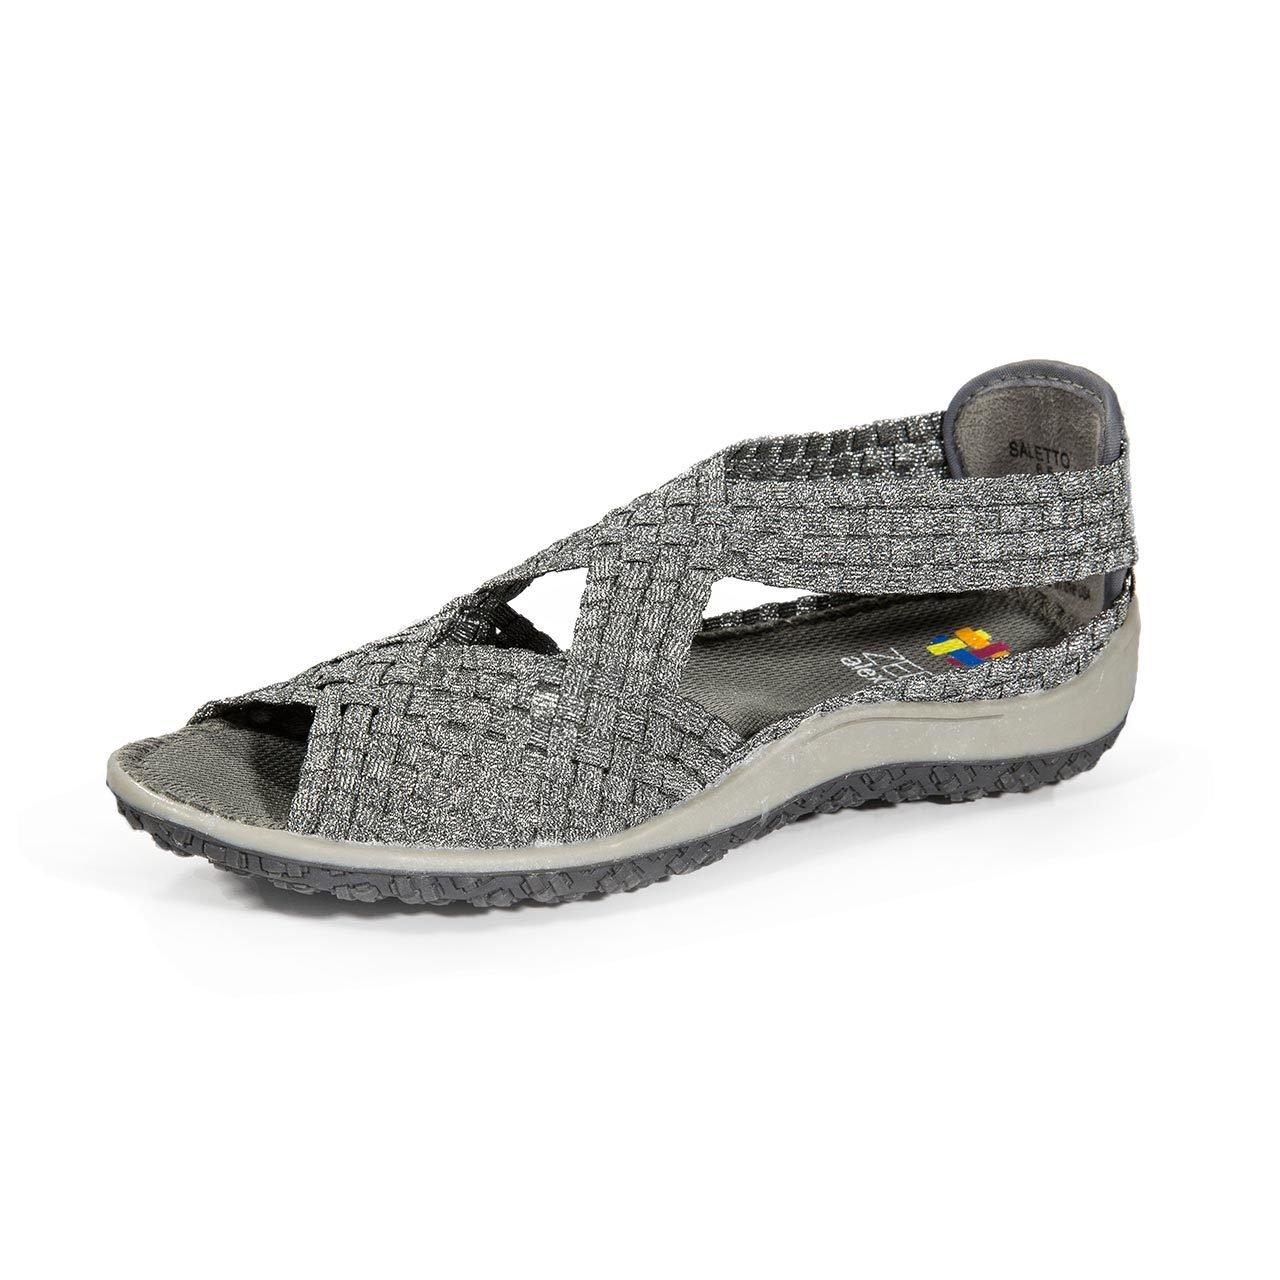 Zee Alexis Saletto Comfort Sandals B01MTC5H9G 8.5 B(M) US|Pewter